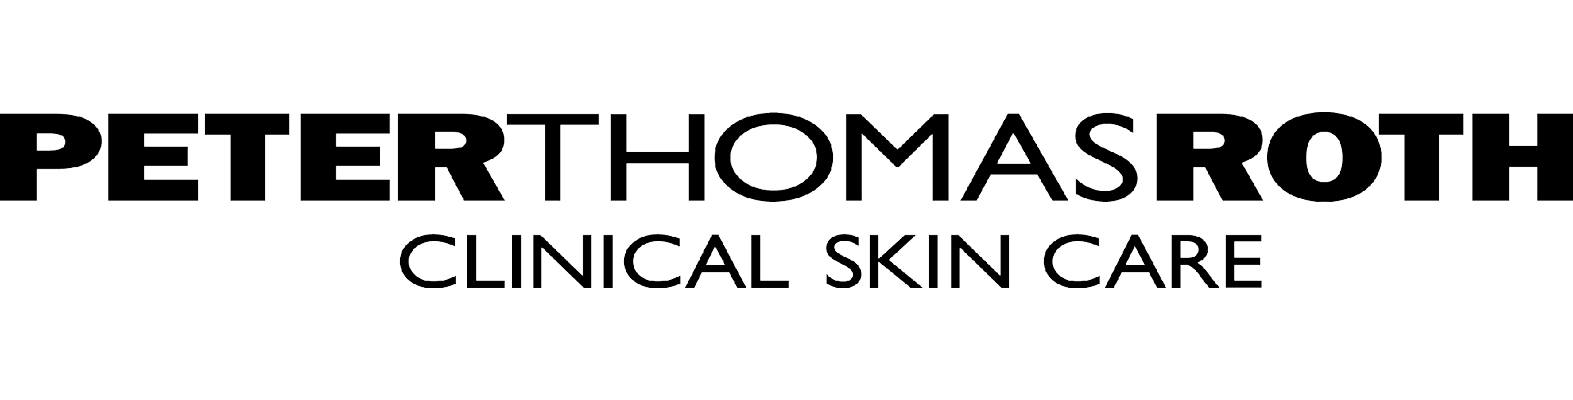 Peter Thomas Roth Logo